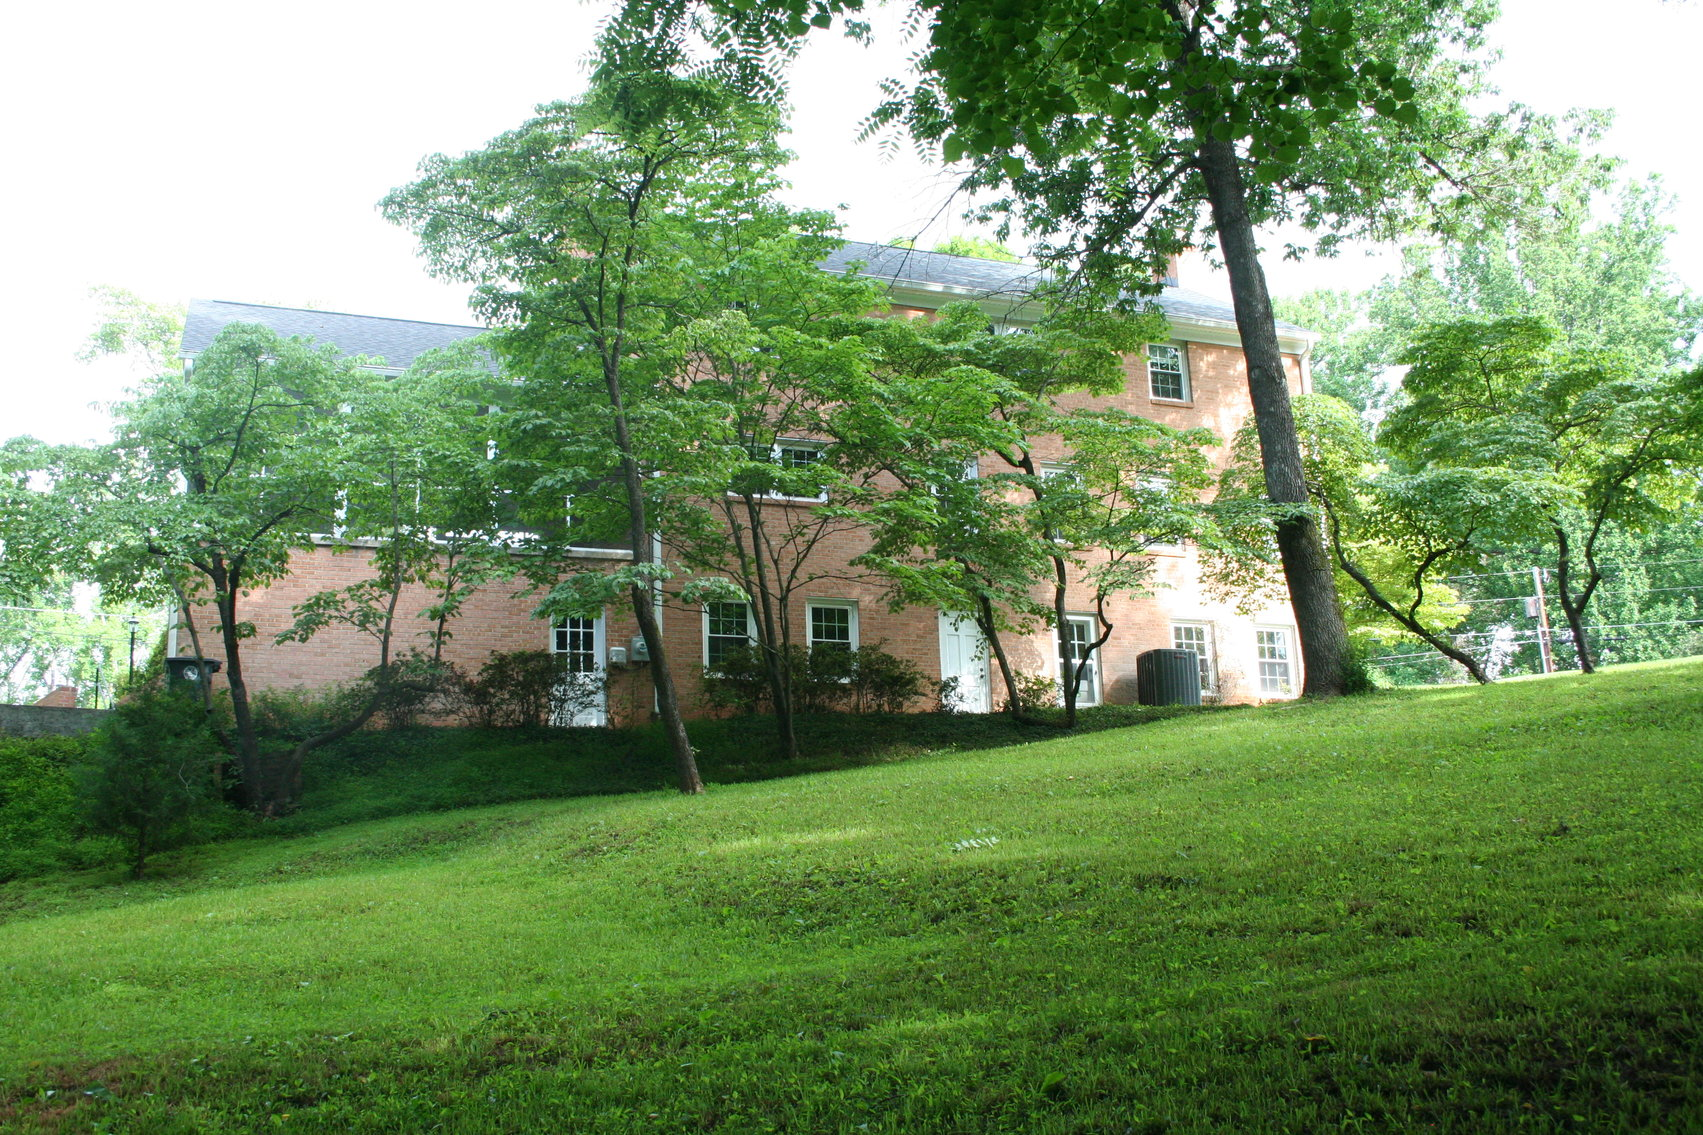 Image for 2324 Heron Hill Place Lynchburg, VA 24503